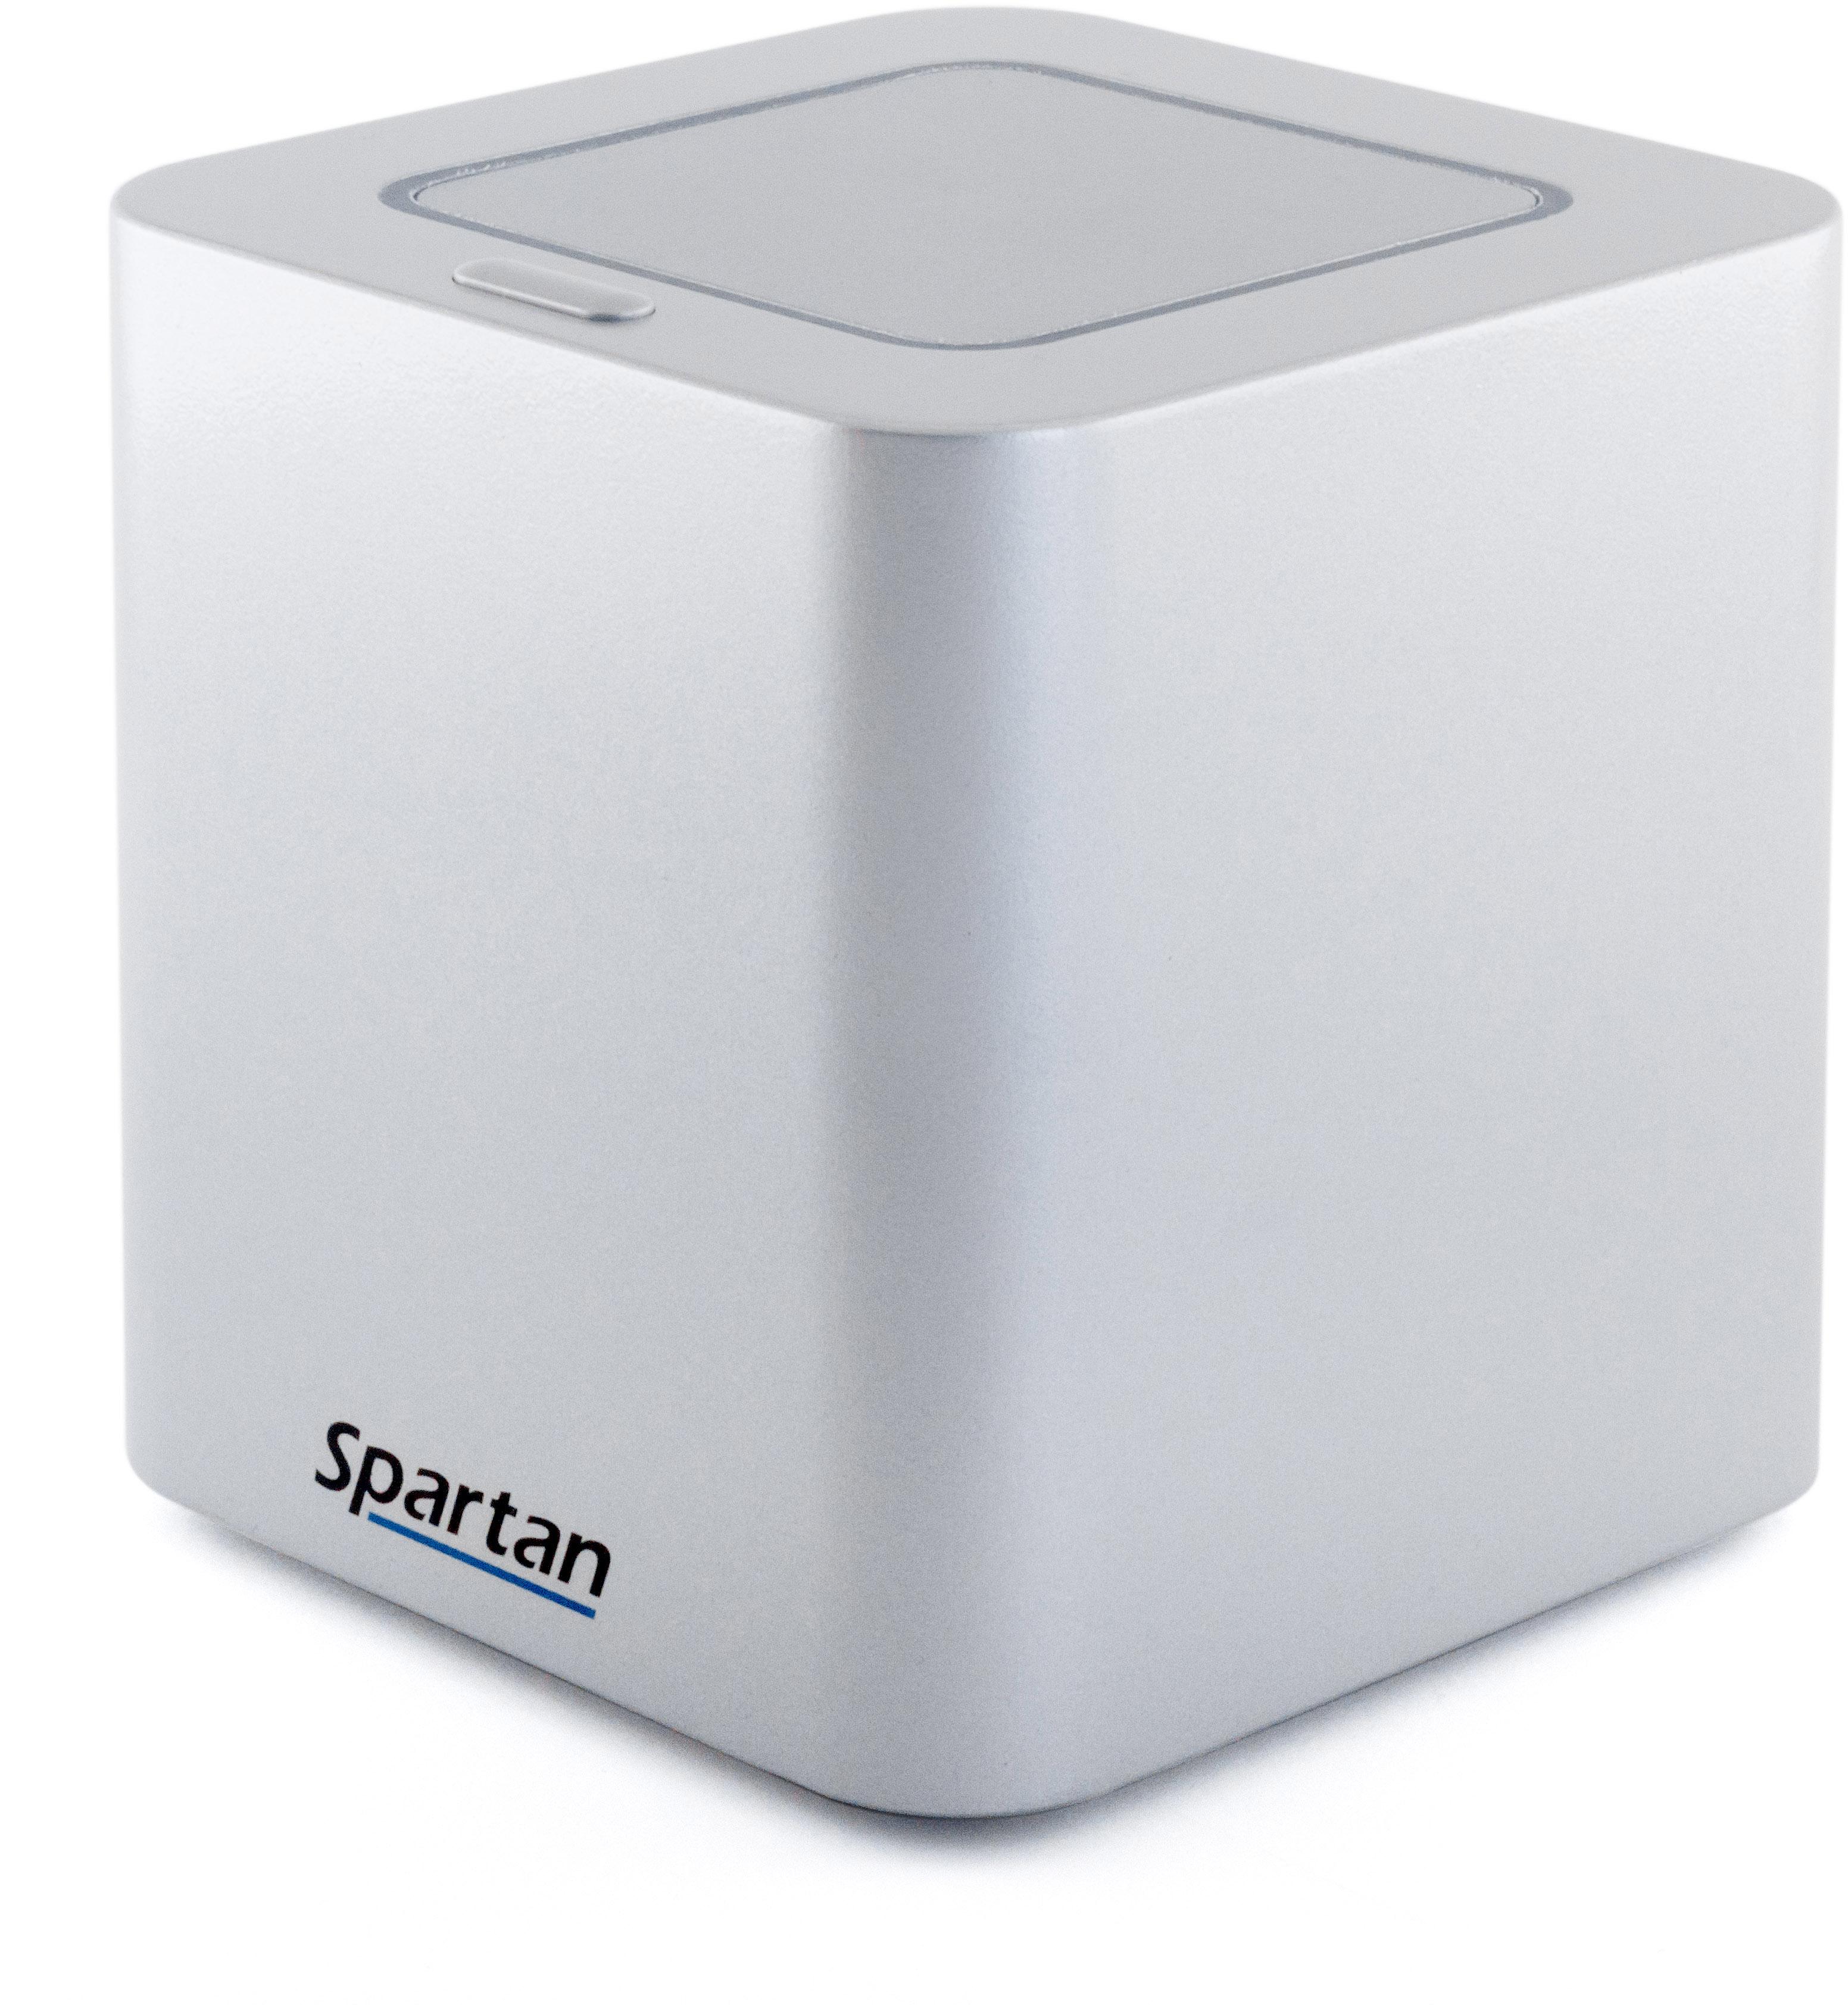 Spartan Legionella Detection System (Spartan Cube)